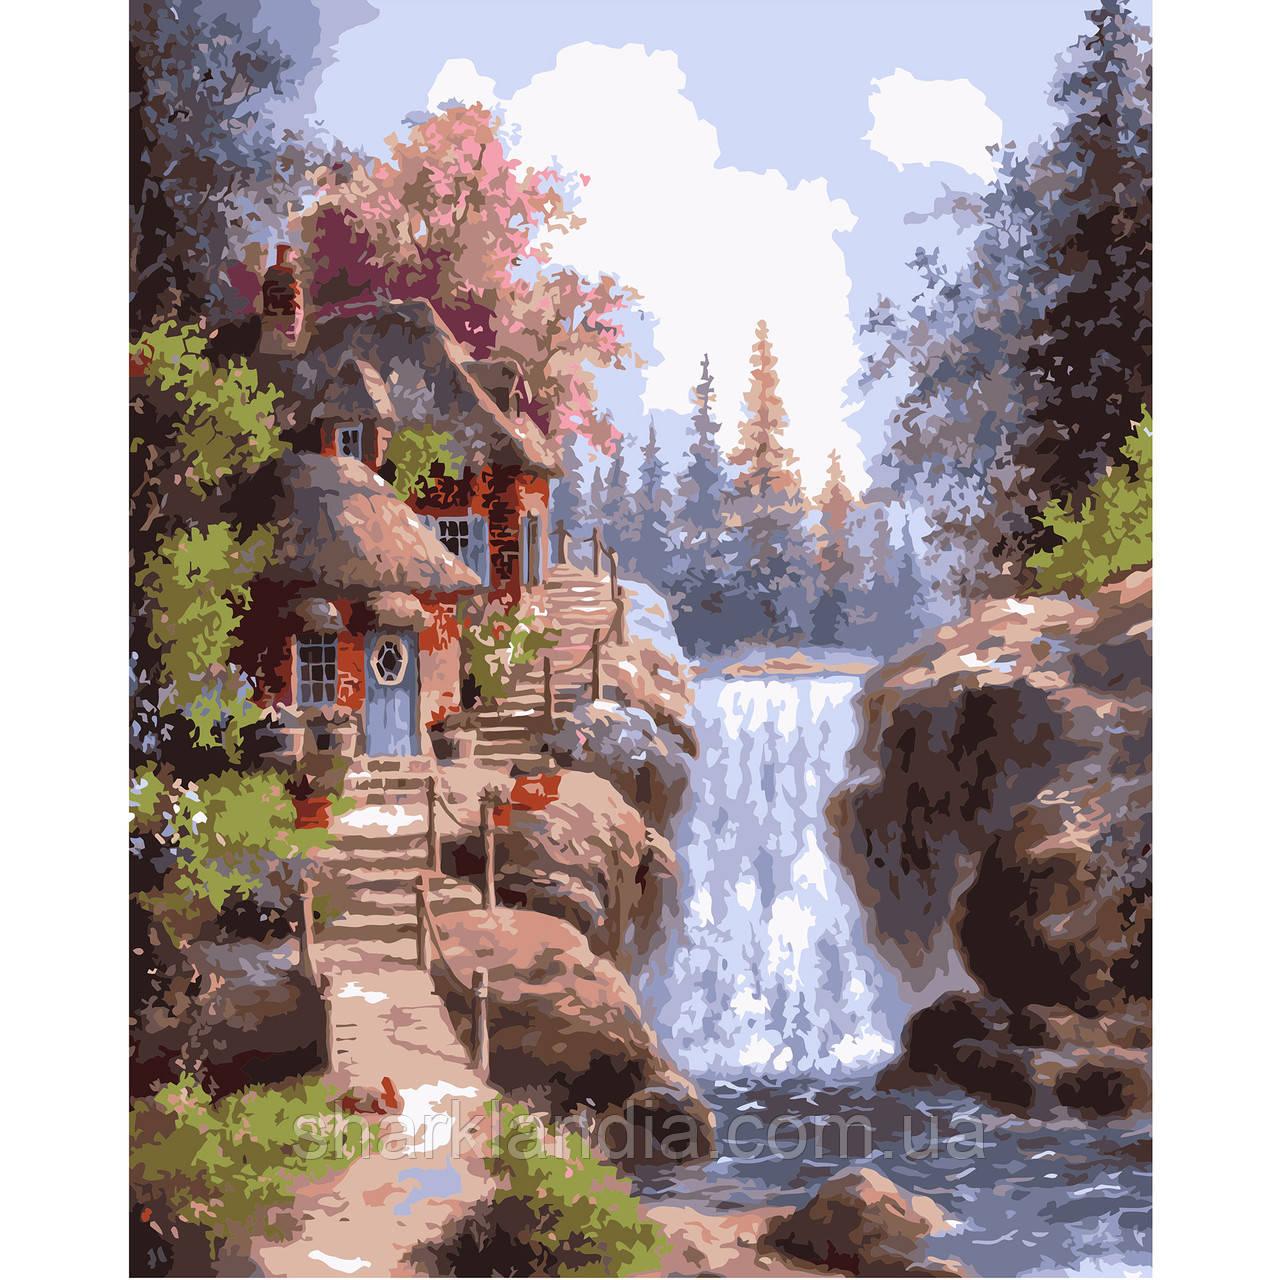 Картина по номерам Домик у фонтана 40*50см Strateg Раскраски Пейзаж Водопад Природа